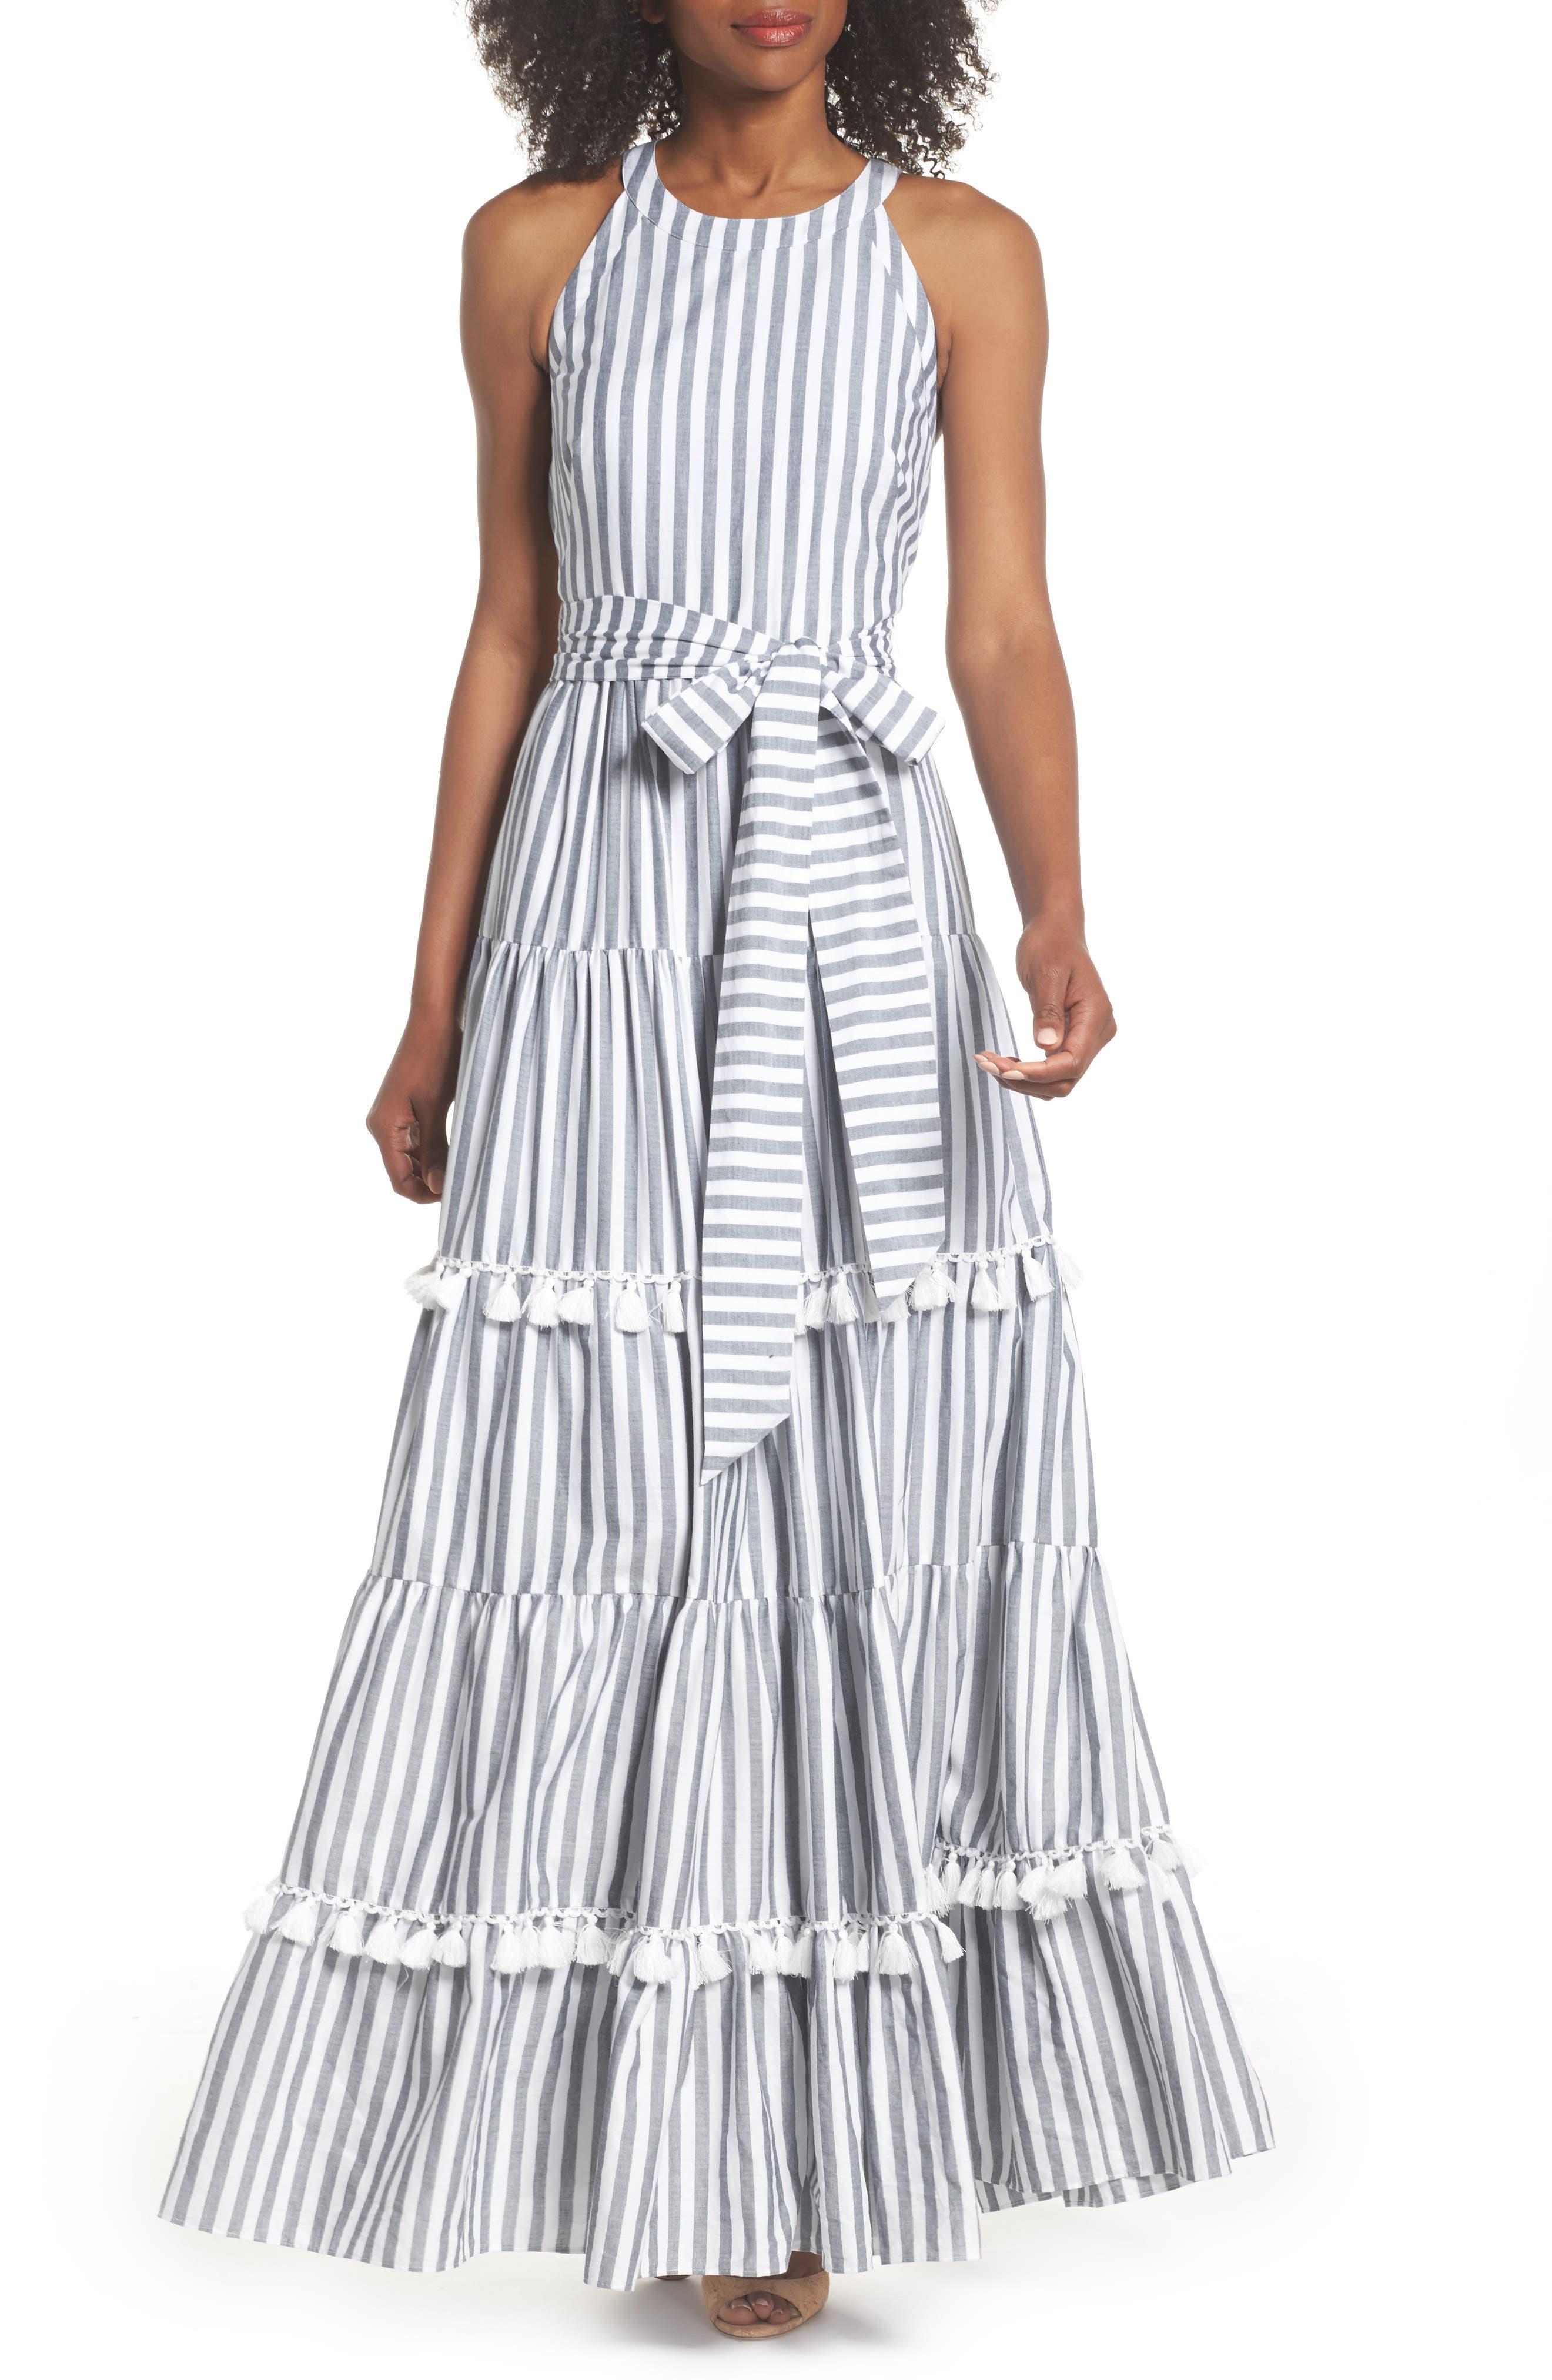 ELIZA J Tiered Tassel Fringe Cotton Maxi Dress, Main, color, IVORY/ GREY